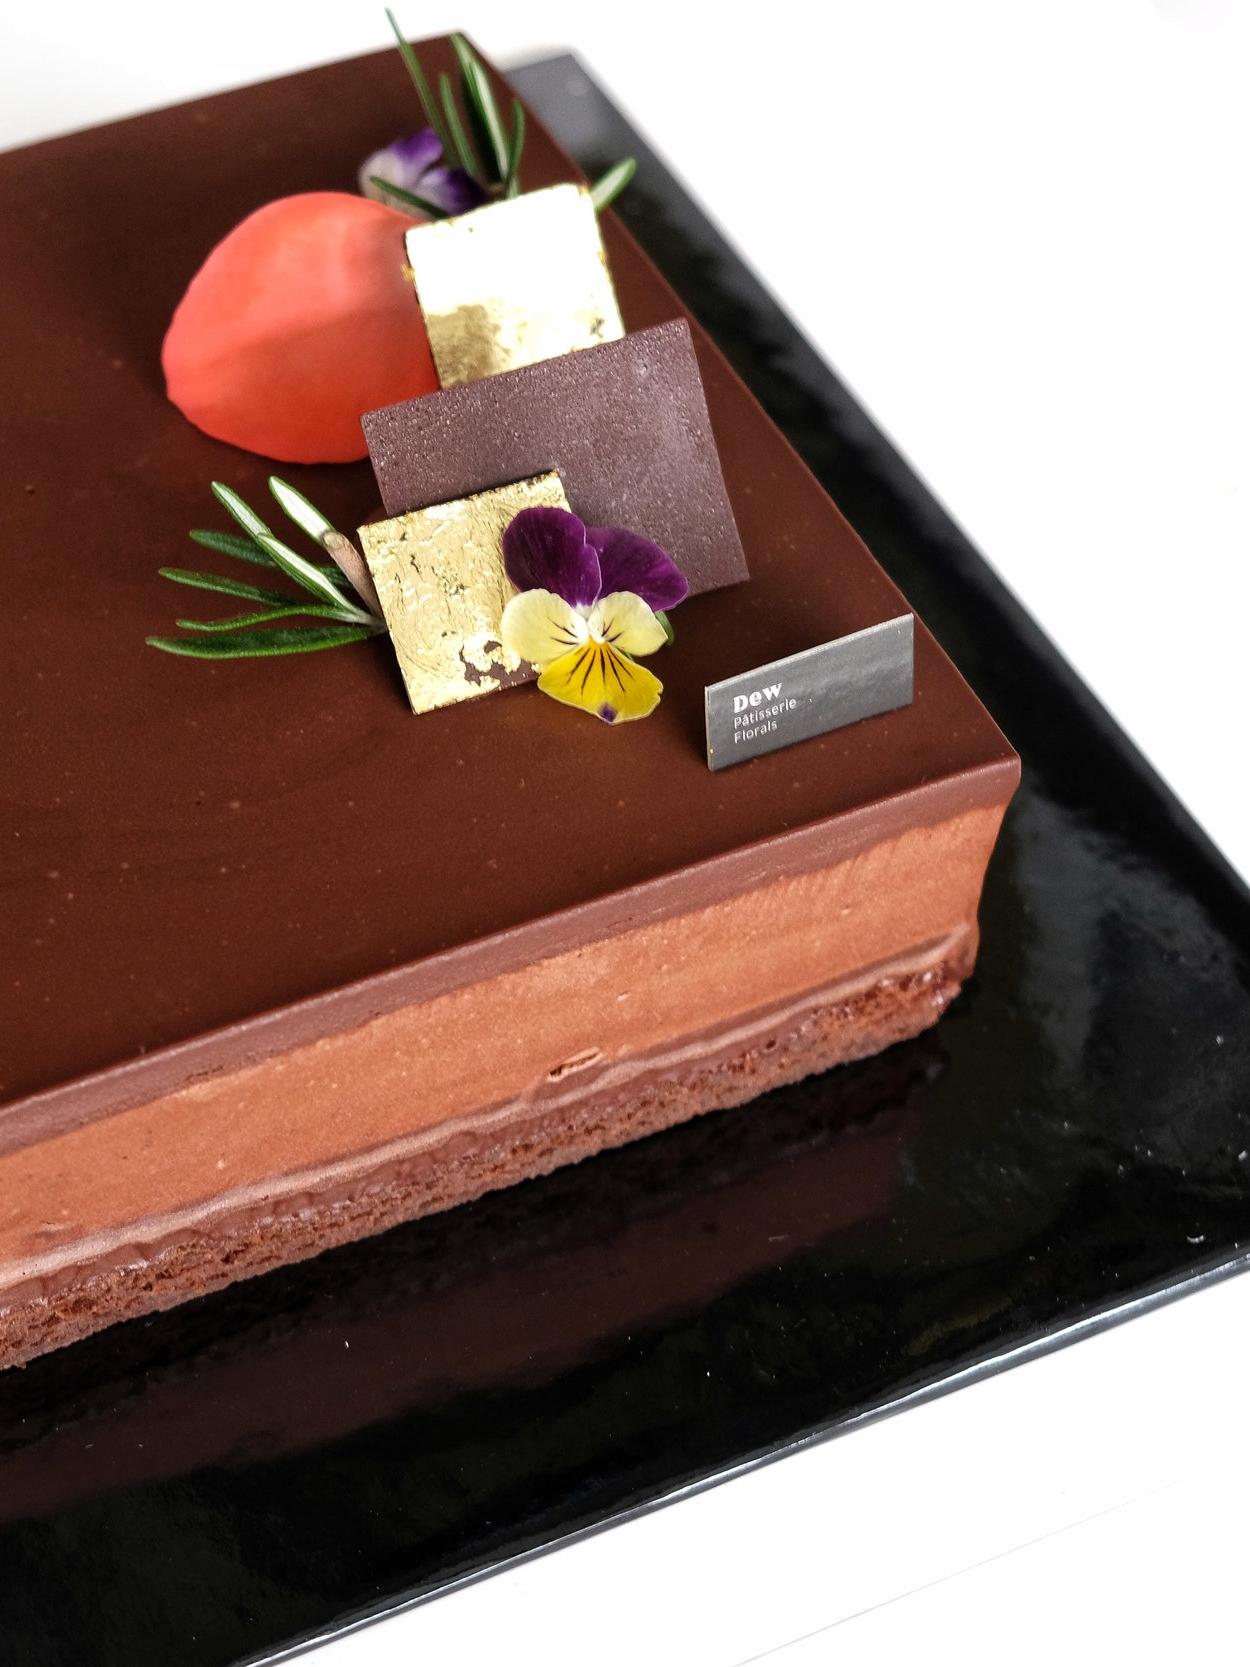 100% Chocolate Cake